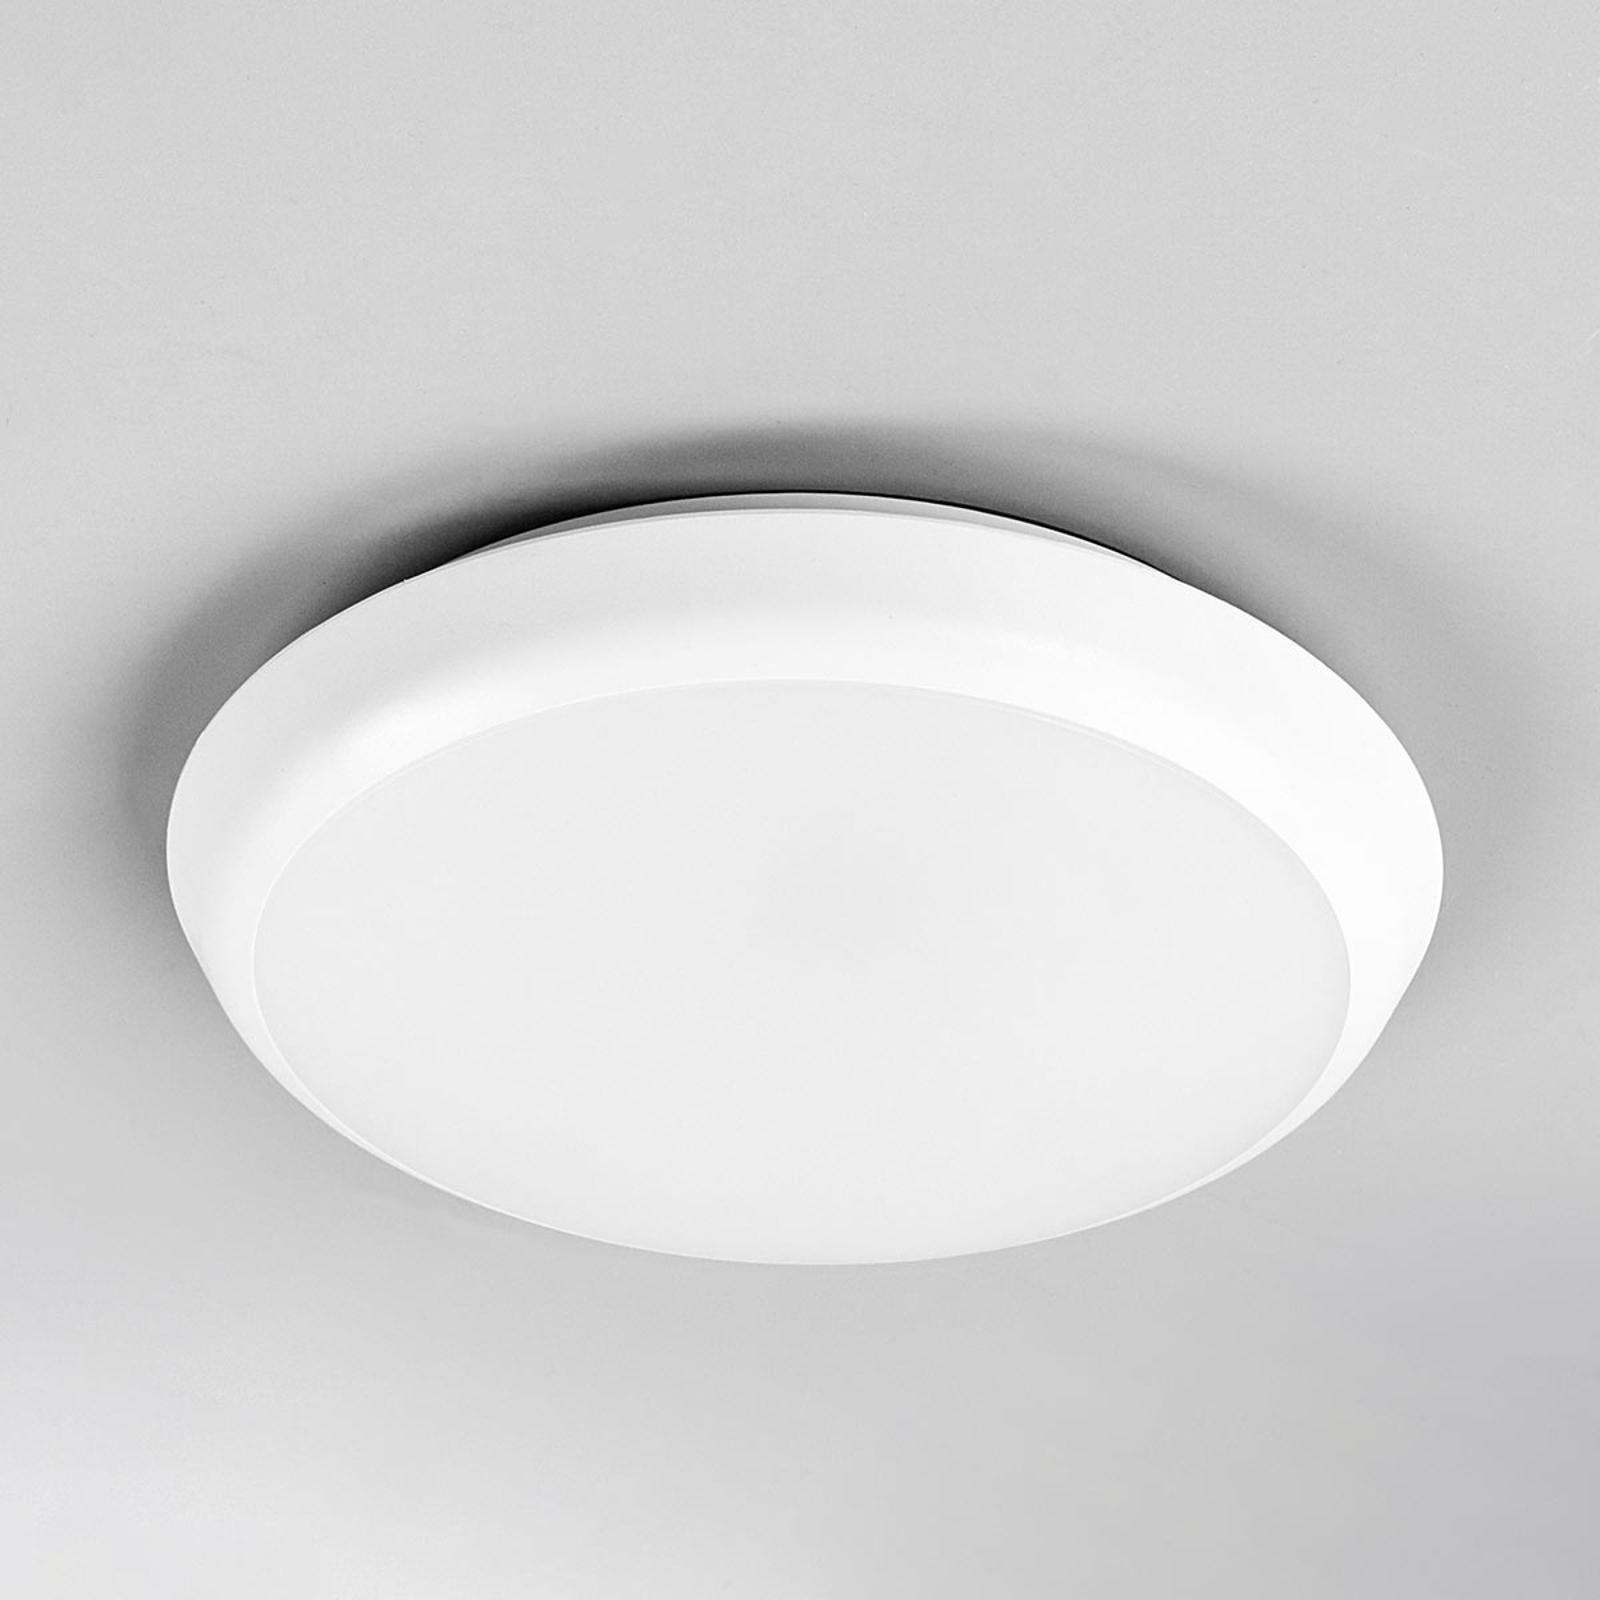 Runde LED-Deckenlampe Augustin, 20 cm